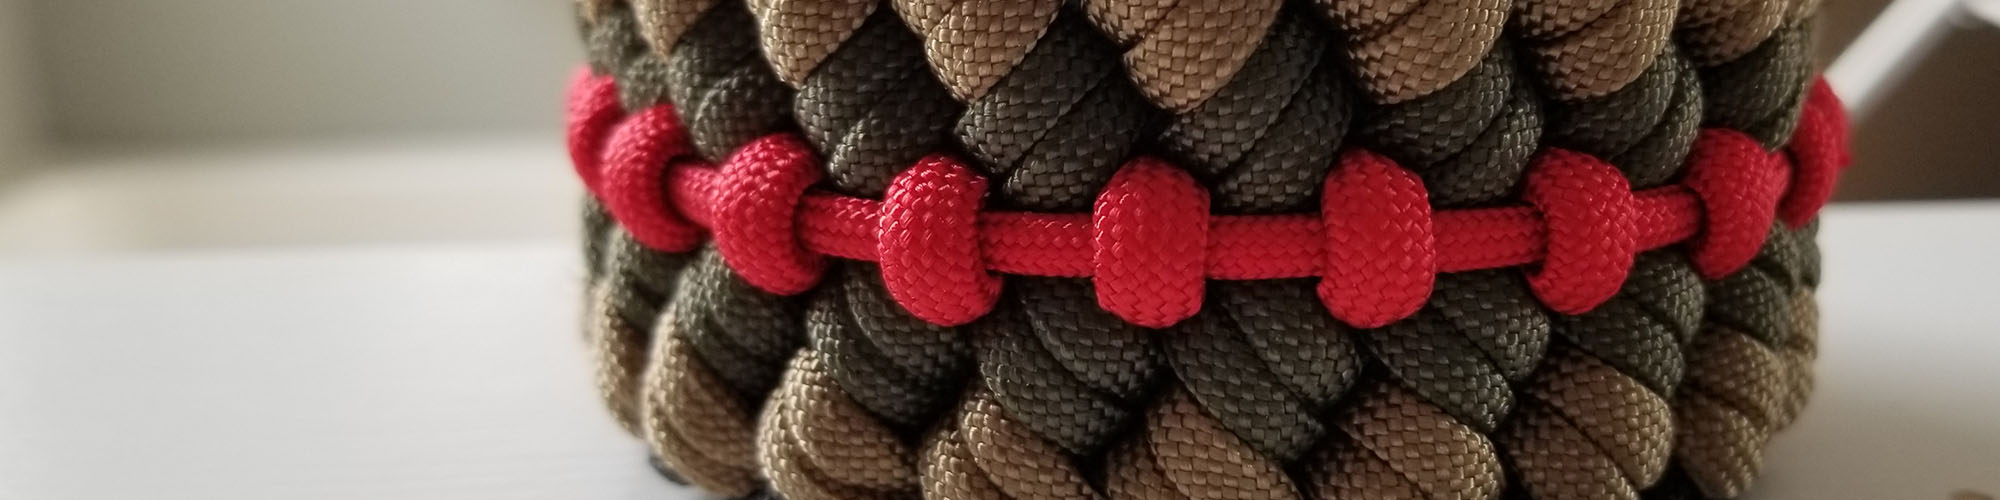 Kahuku paracord bracelet